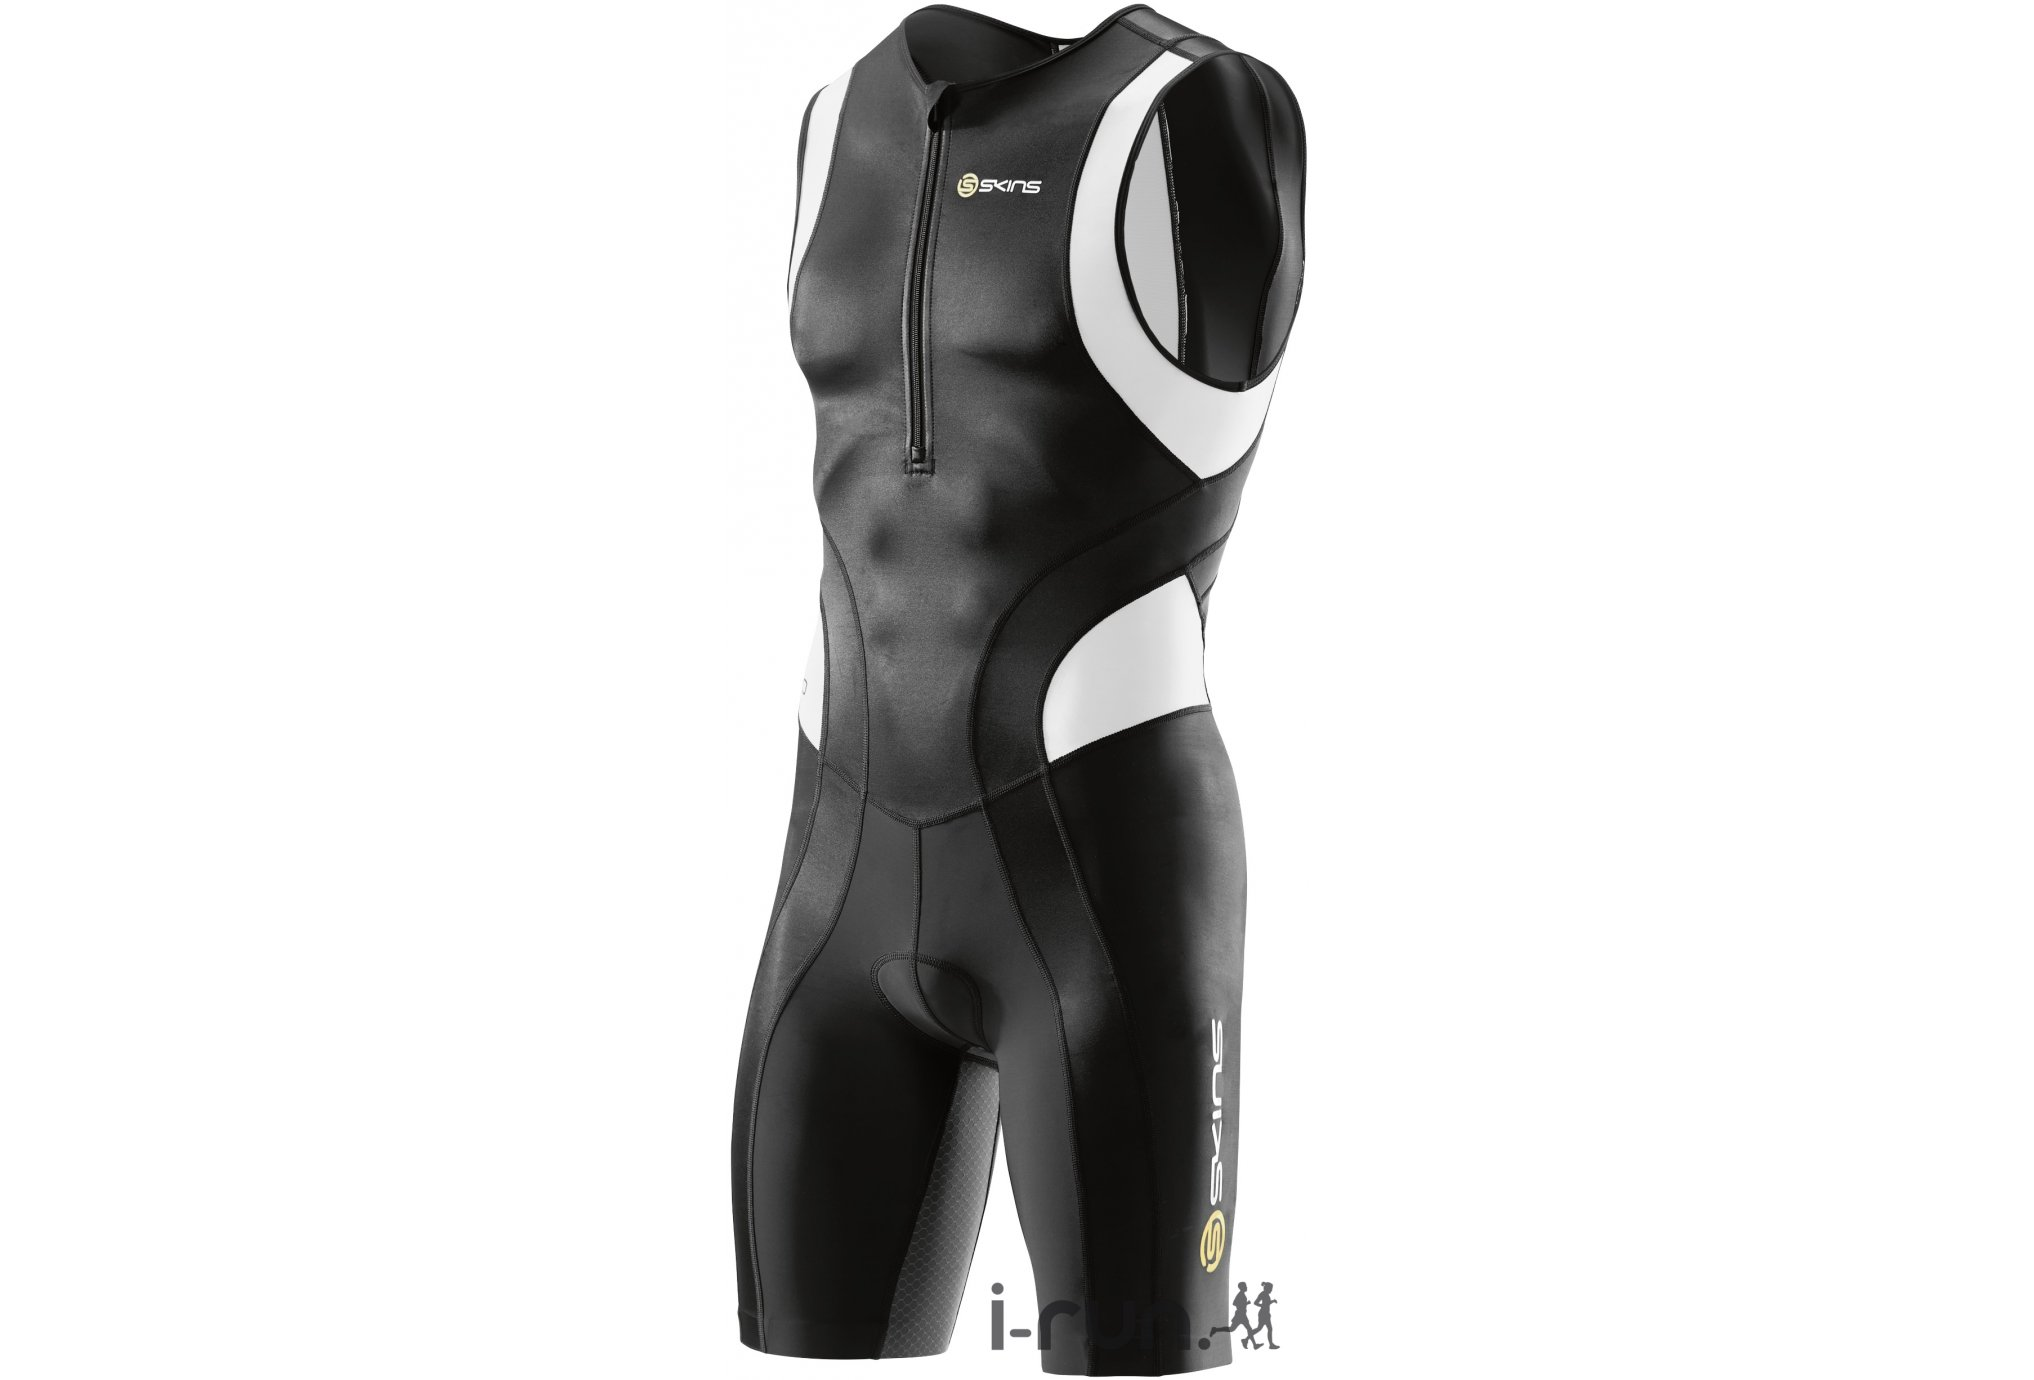 Skins Combi Tri400 M vêtement running homme